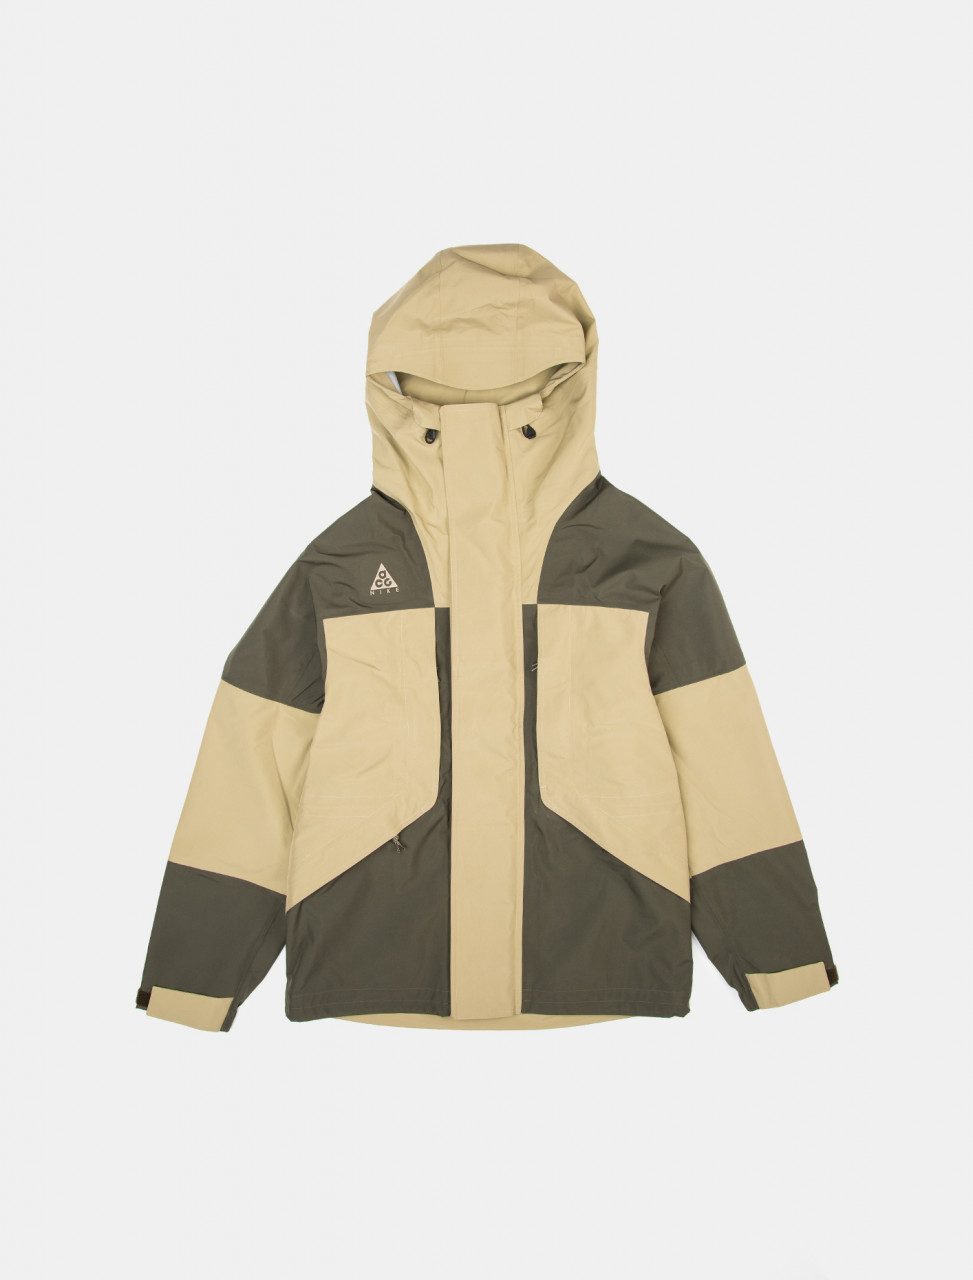 ACG Hooded GORE-Tex Jacket